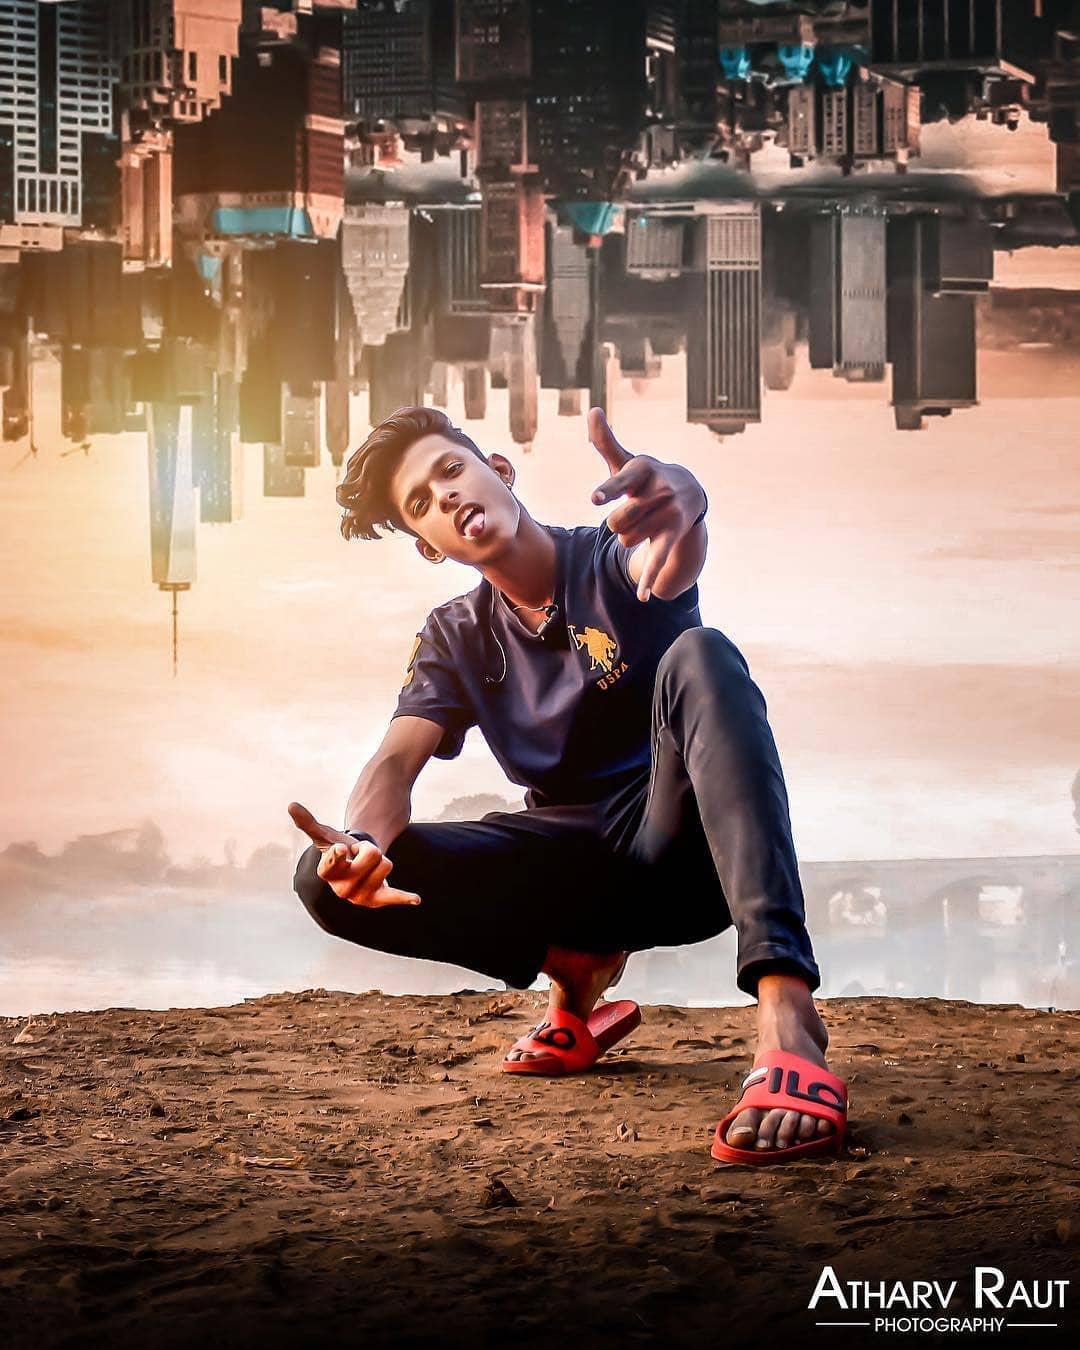 Visual Photo Editing | City Boy - Tutorial Photoshop cc